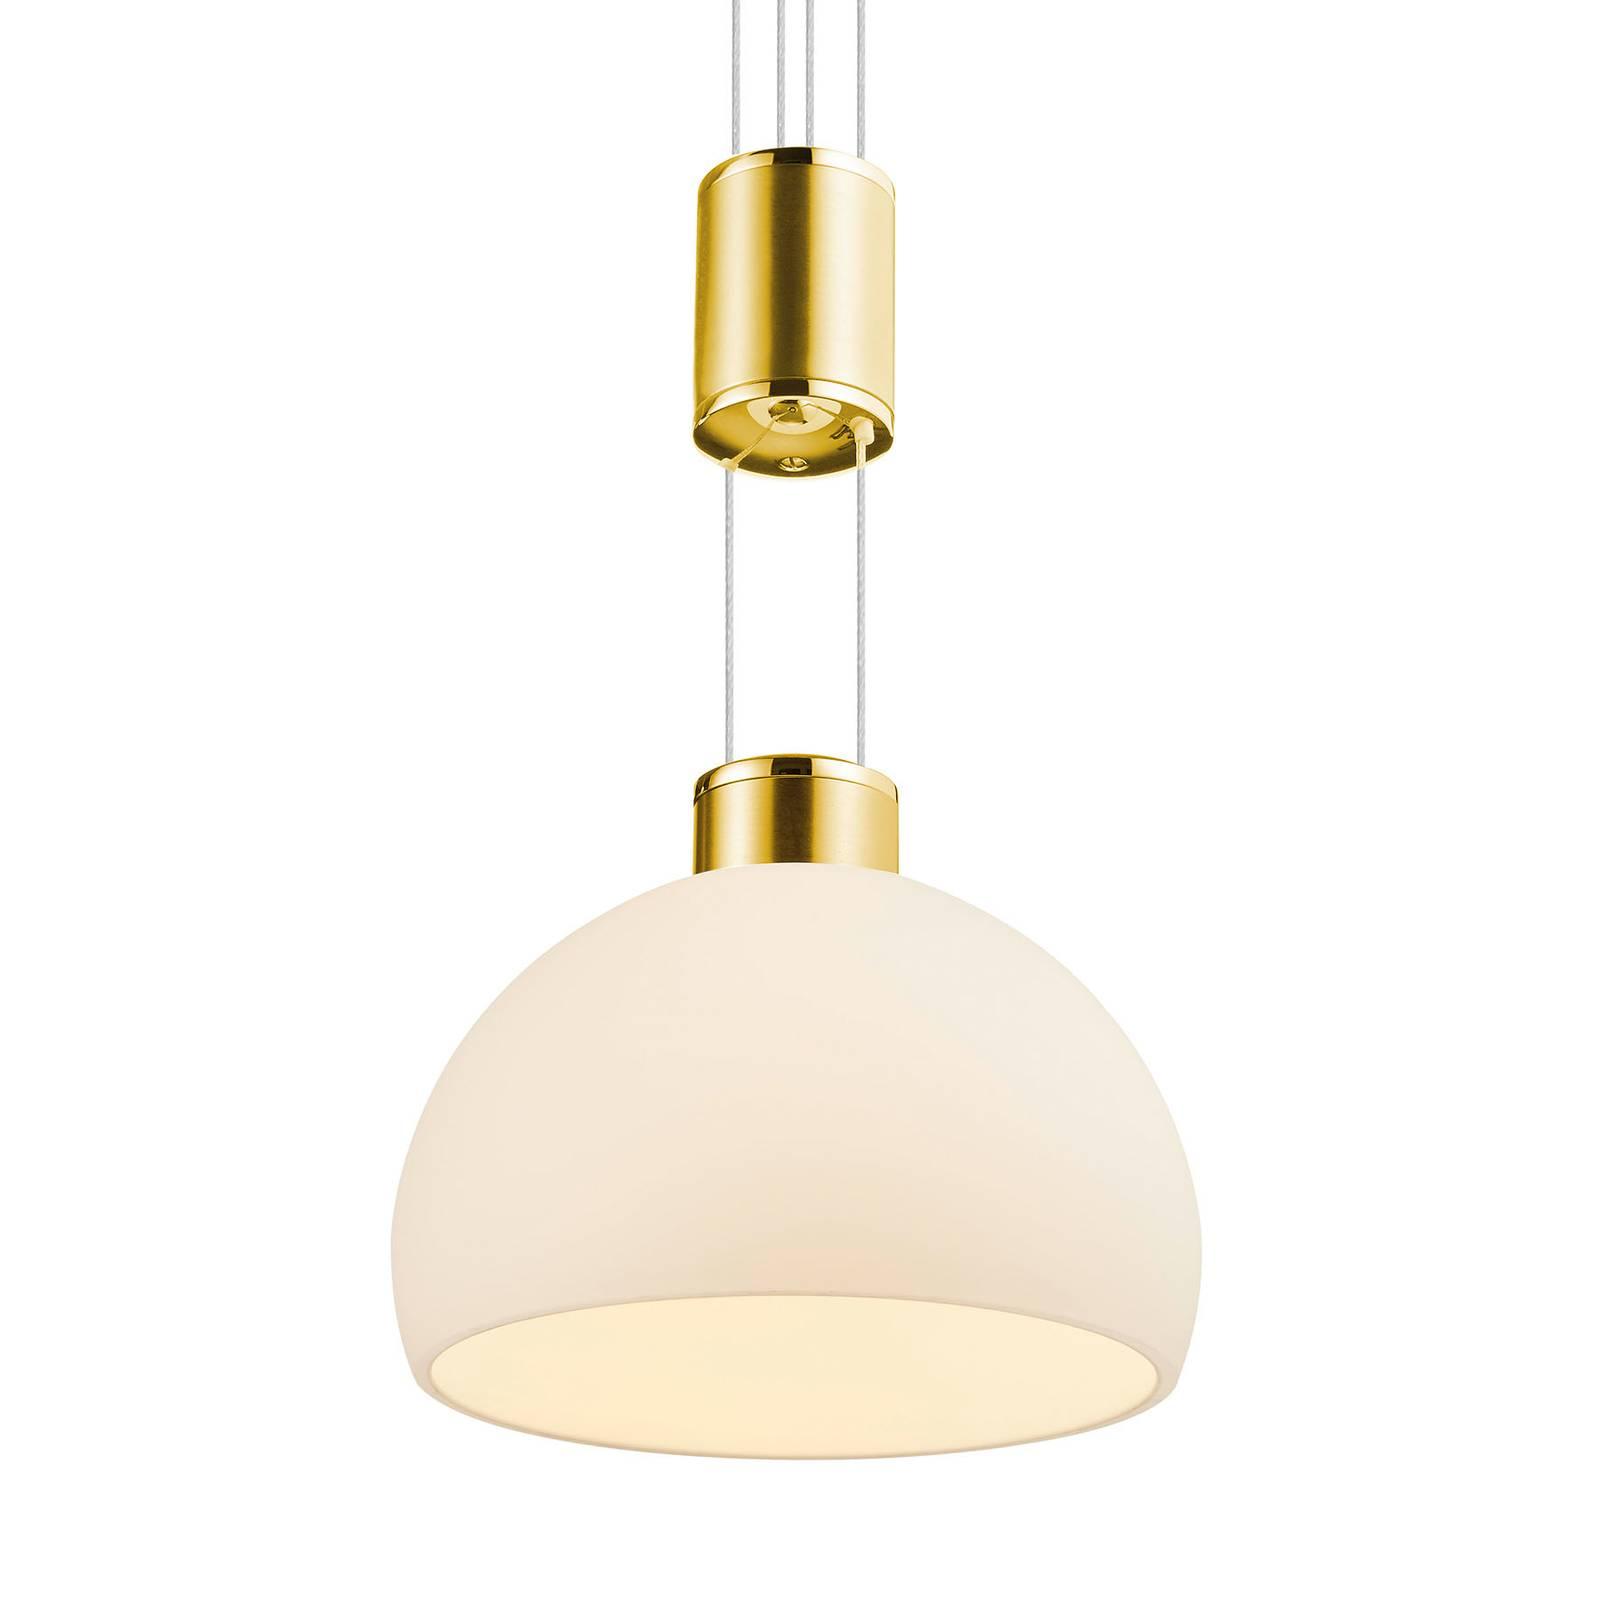 BANKAMP Meesterwerk hanglamp 3-lamps messing